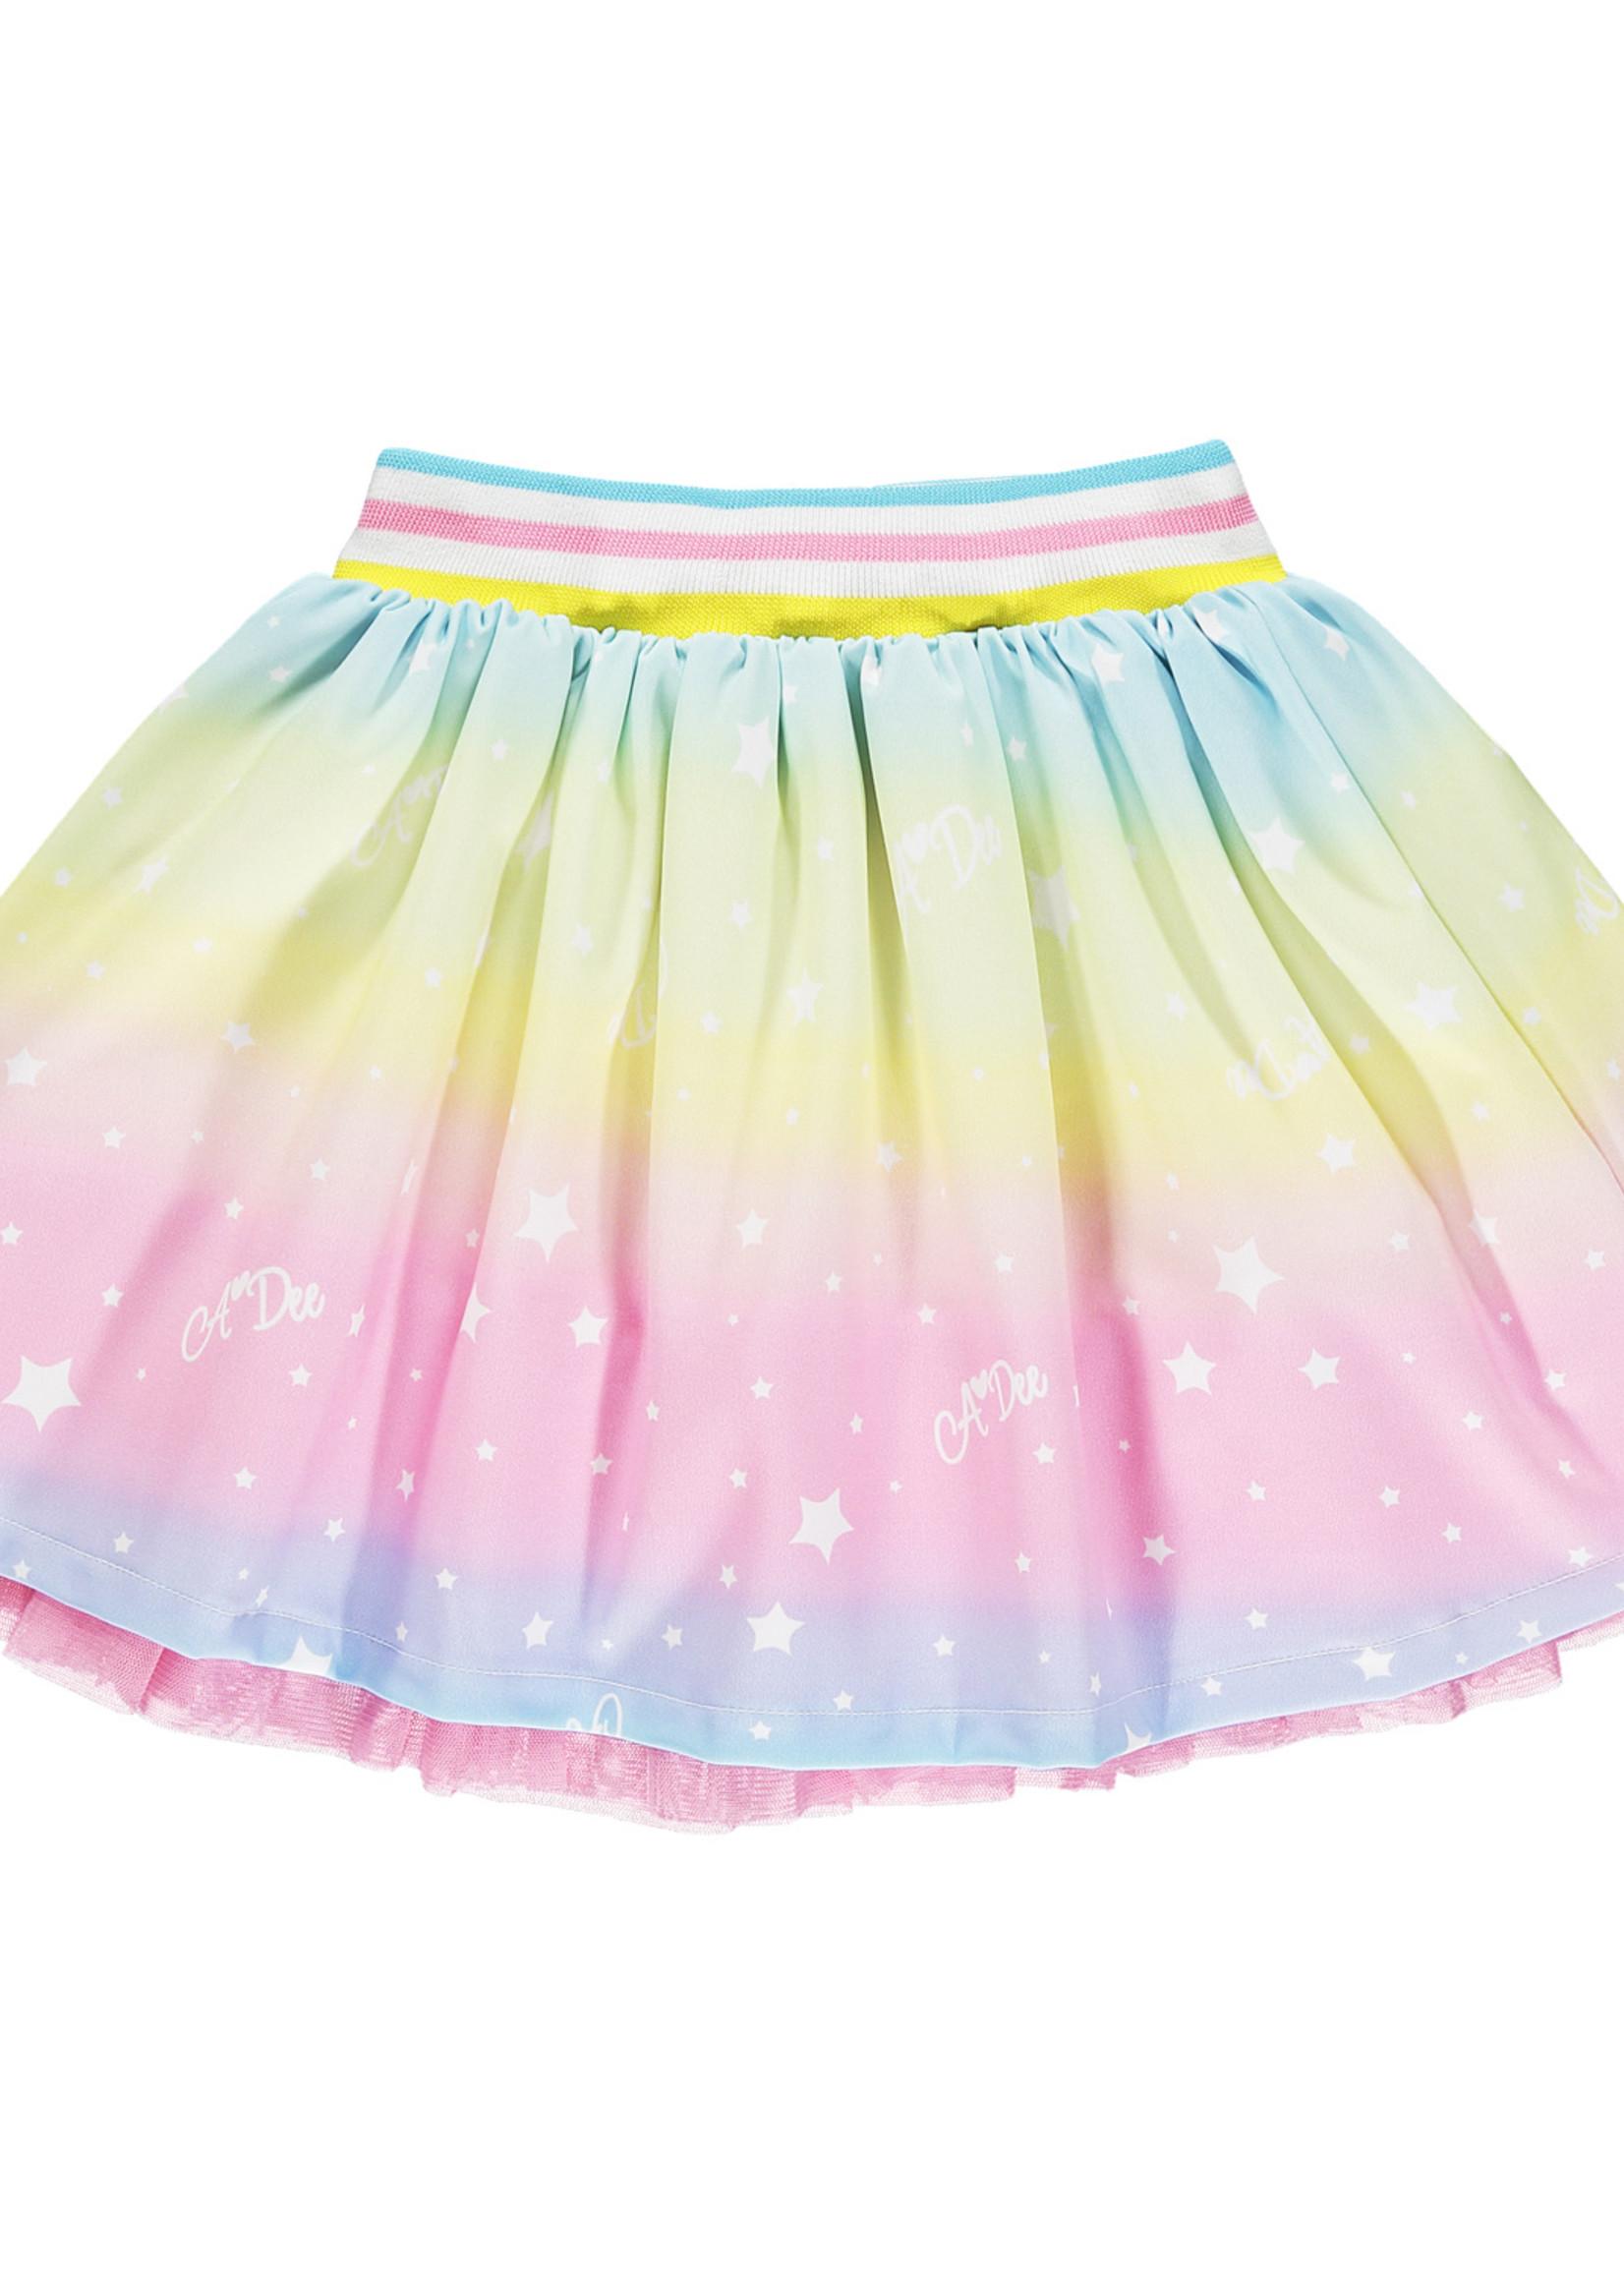 A Dee Noemi rainbow print skirt